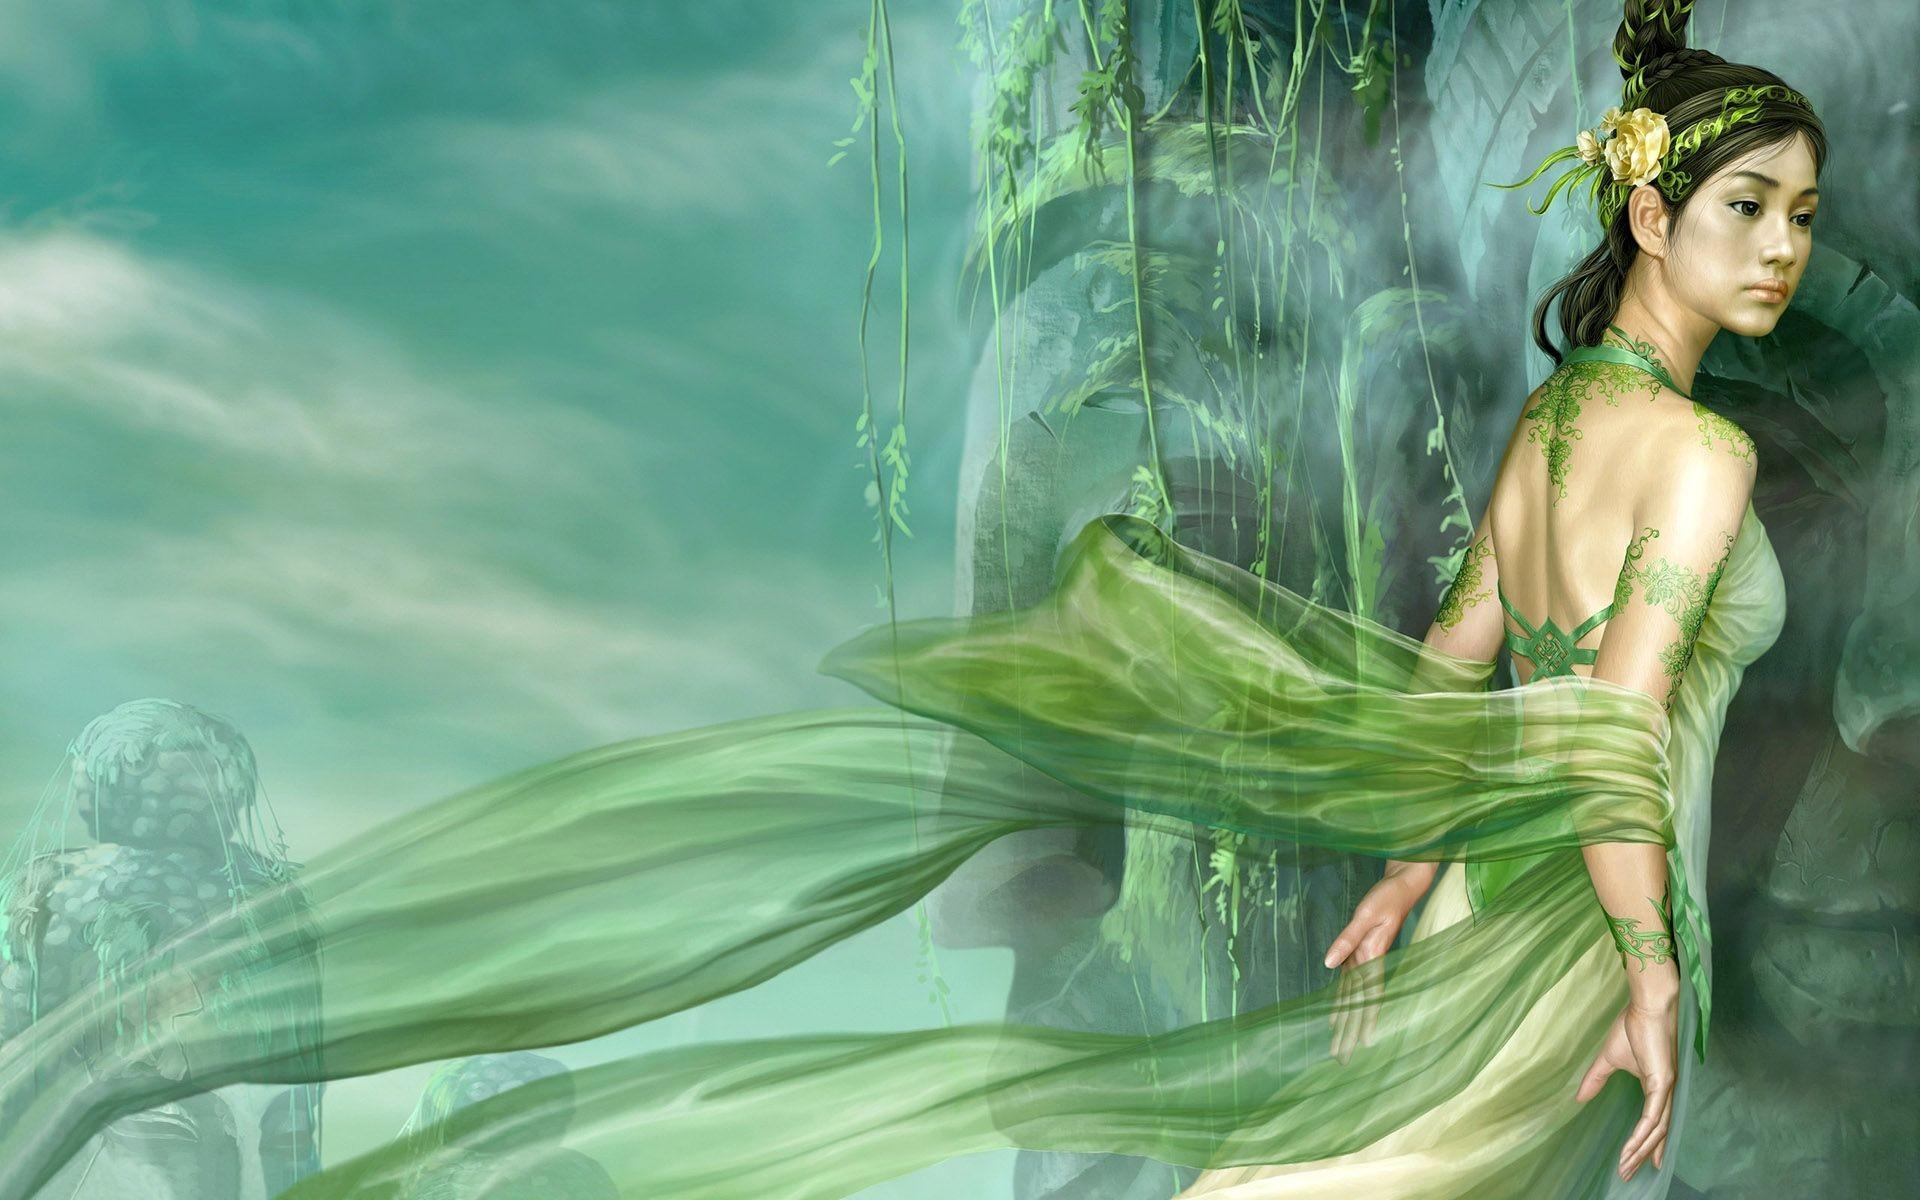 Res: 1920x1200, WOMEN IN GREEN, 3d, abstract, angel, Art, dream, fairy, fantasy, garden,  Girl, GREEN, GREEN LADY, LADY, WOMEN